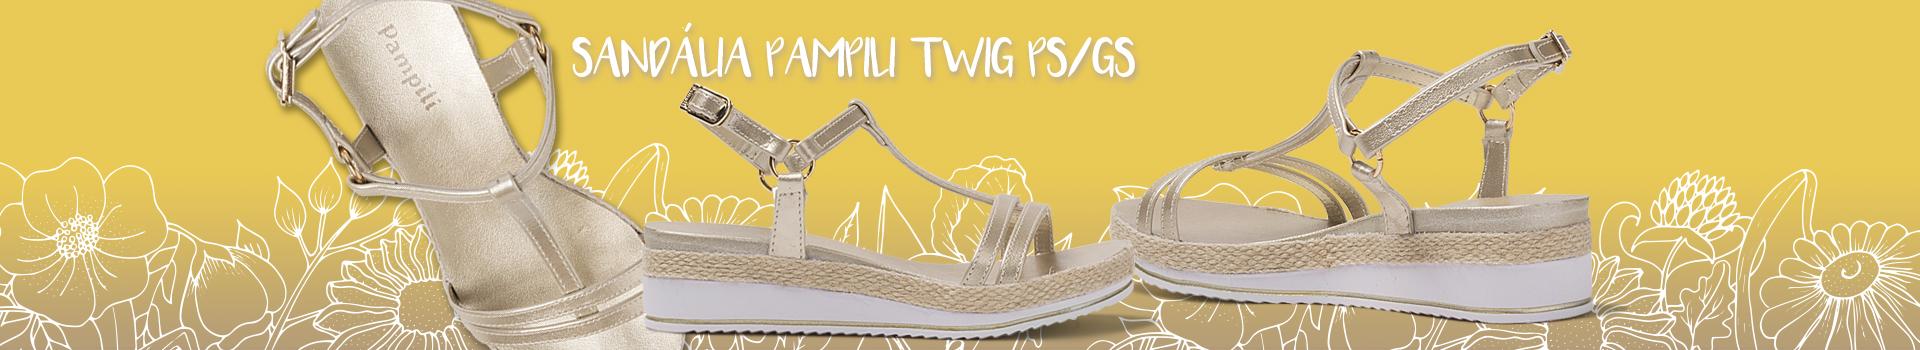 tvdesk_p5-14_01_19-Pampili_Twig